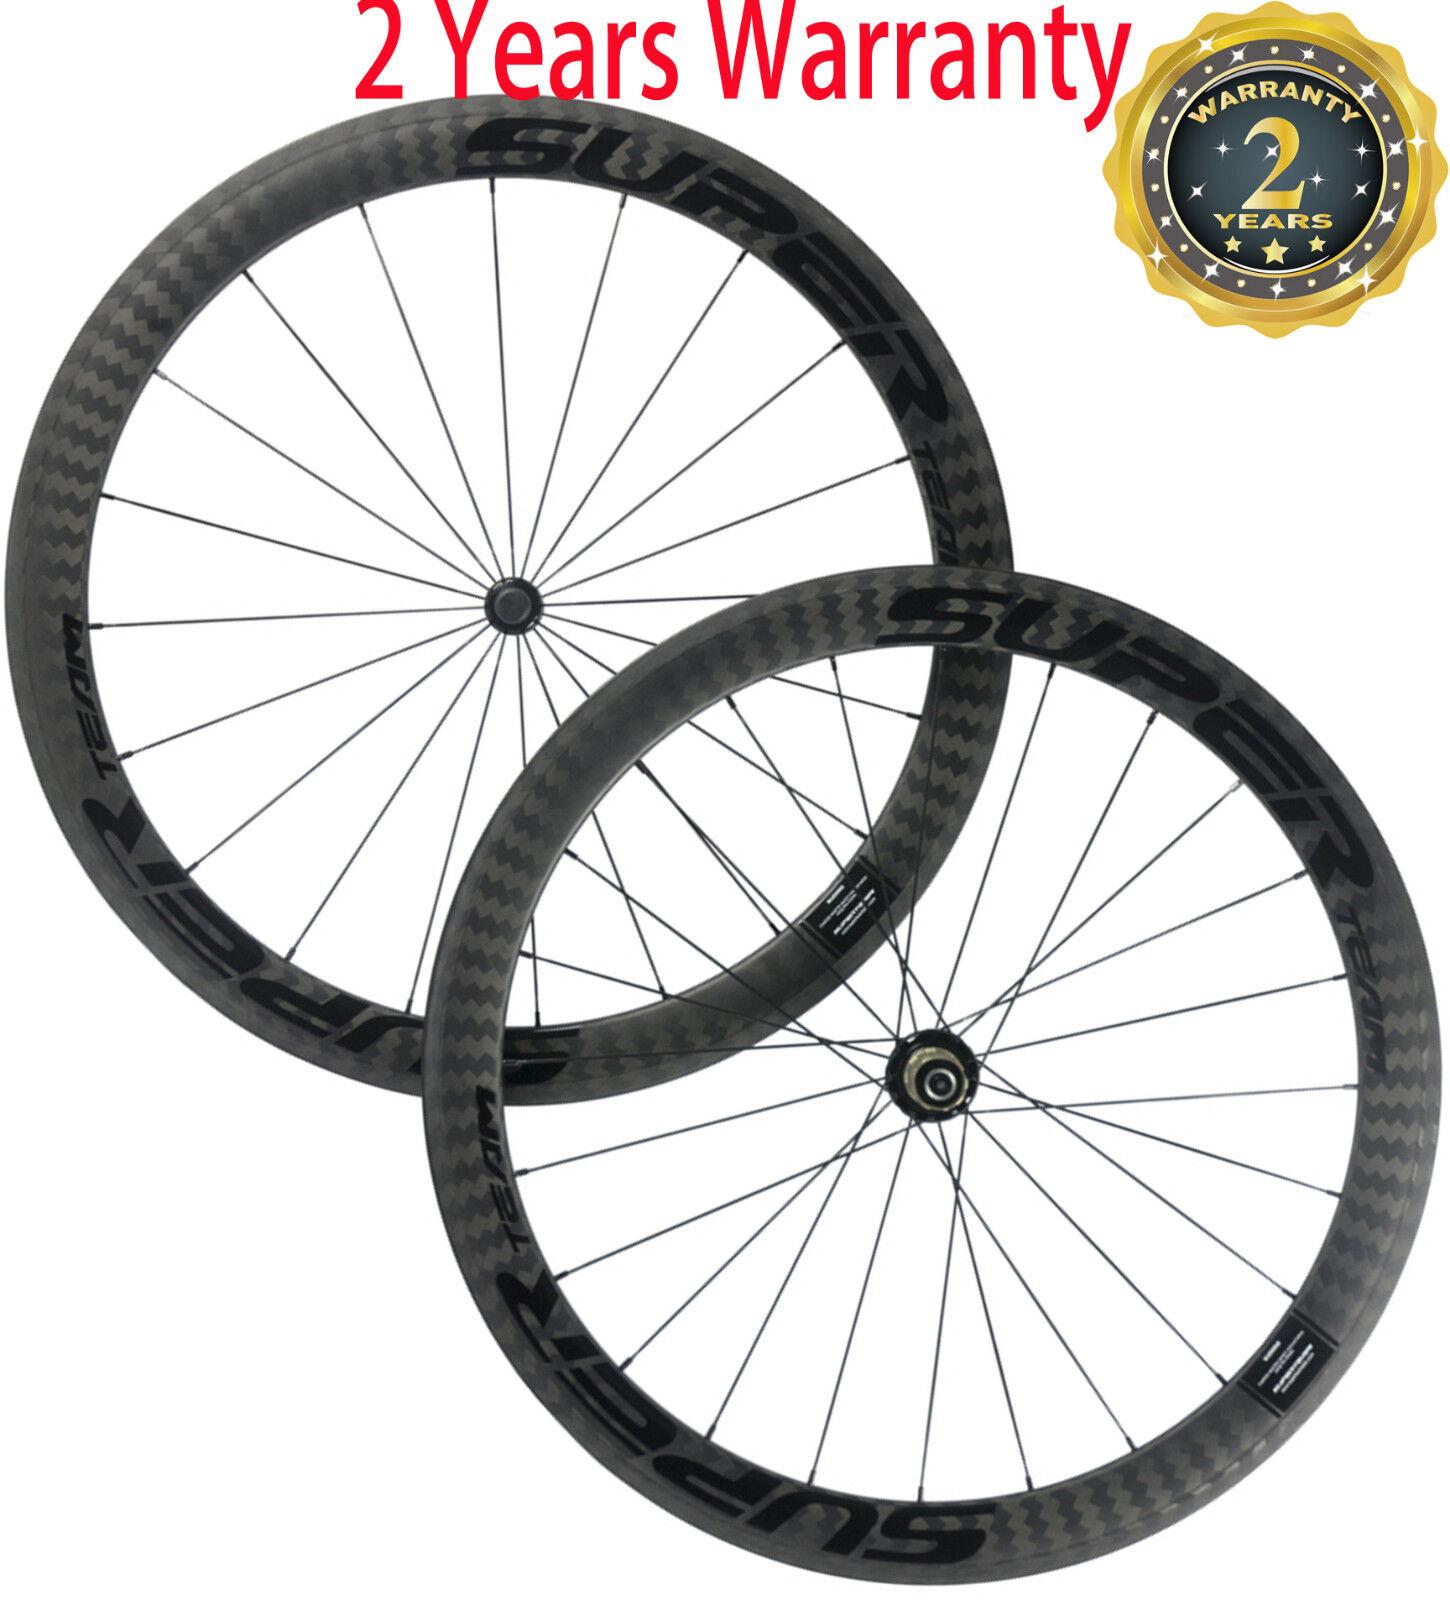 Carbon Wheels 50mm 25mm Width U Shape Clincher Wheels R36 700C Bicycle Wheelset